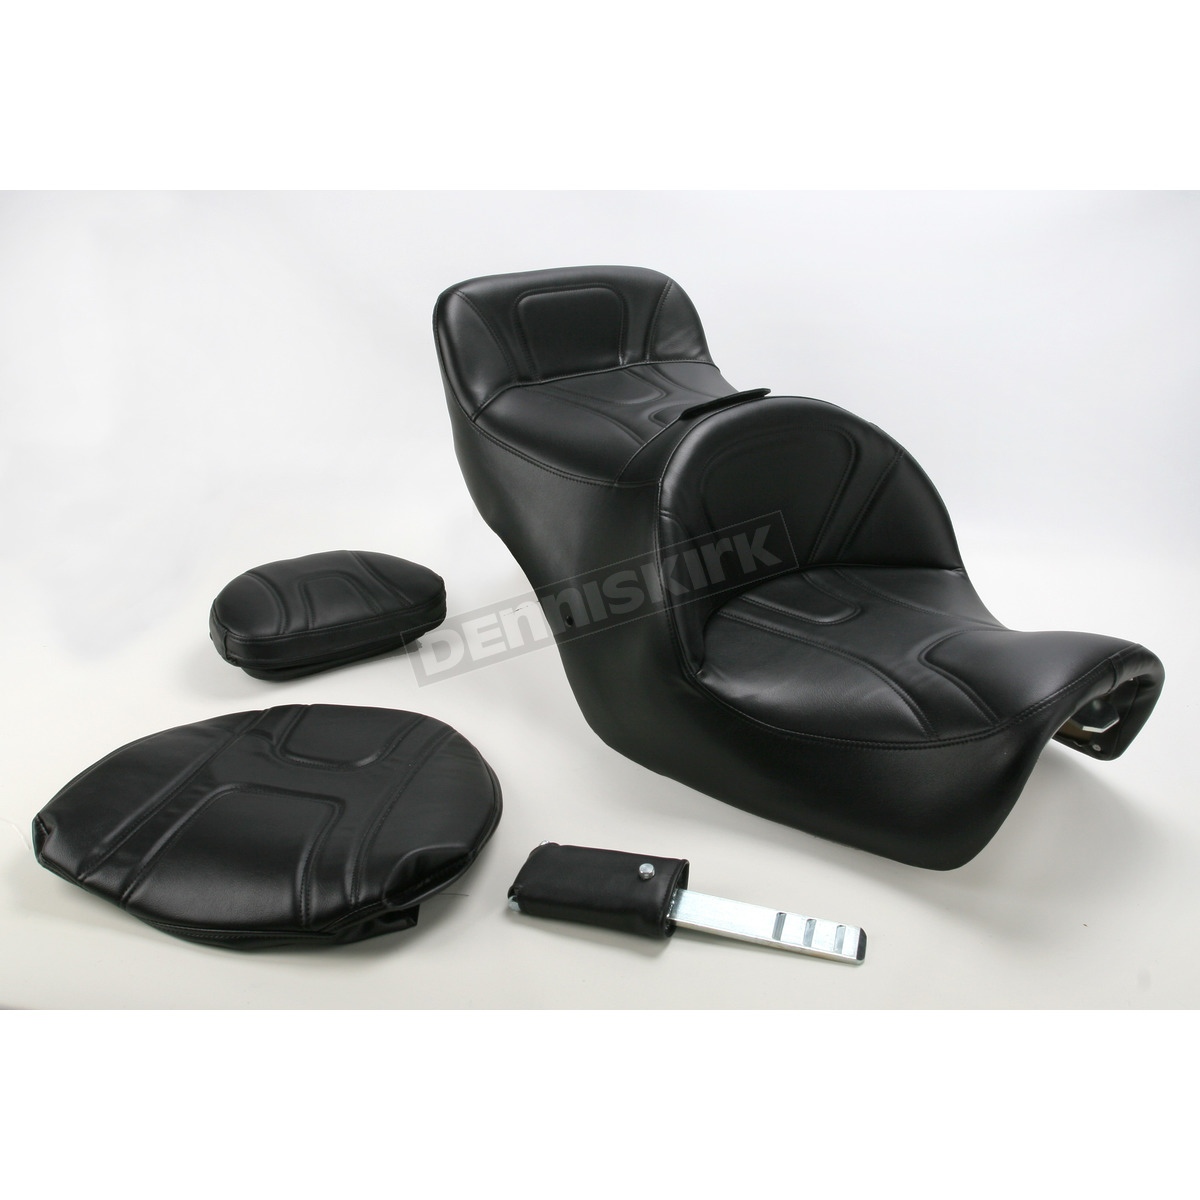 road sofa seat goldwing cama mercadolibre costa rica saddlemen w backrest h973j motorcycle